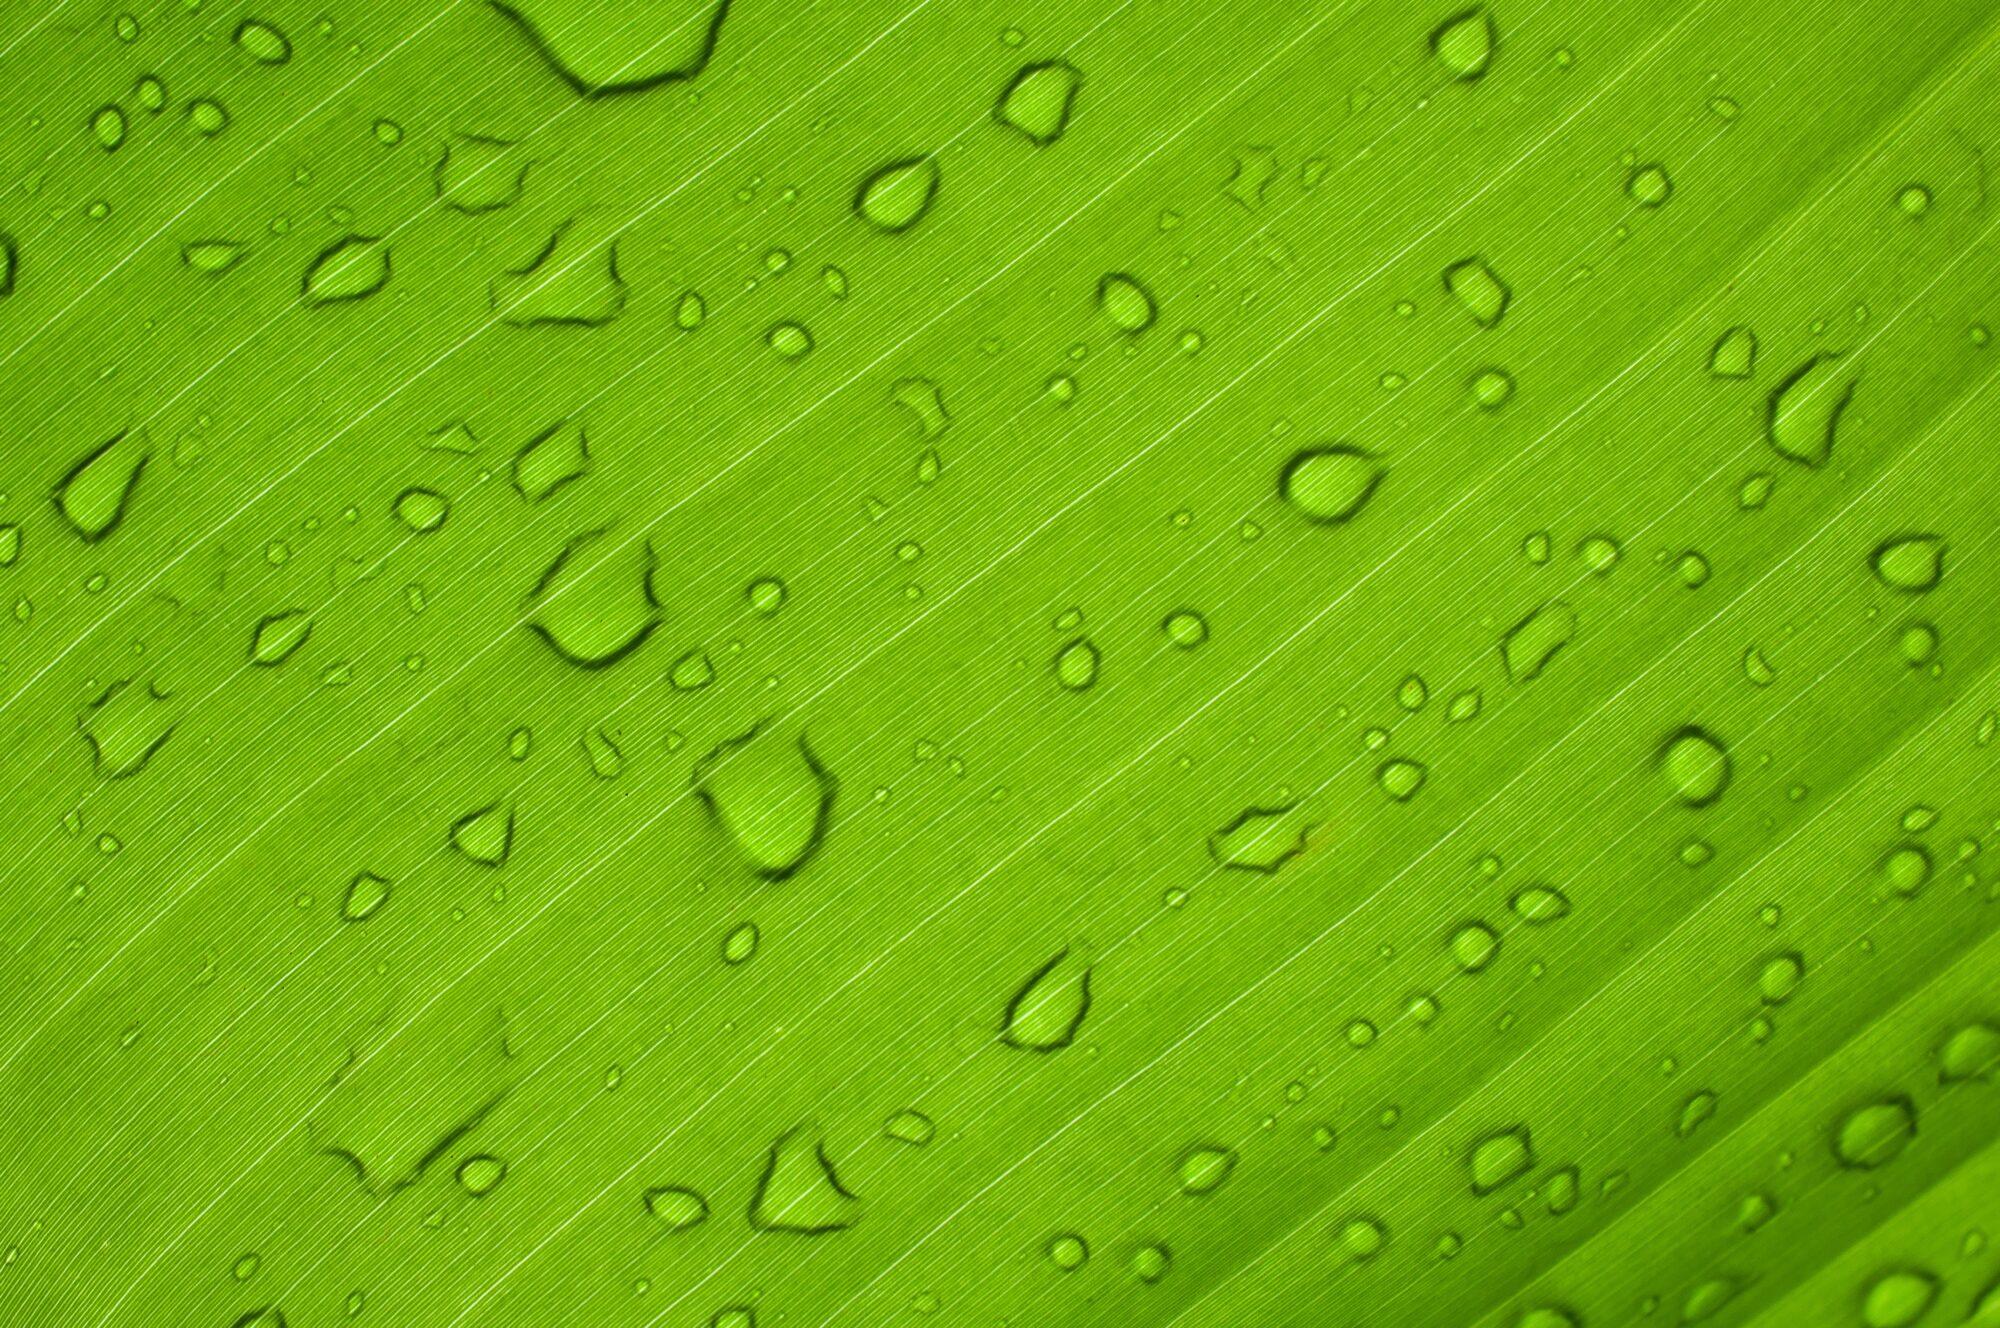 EcoRise Joins Austin Green Business Leaders